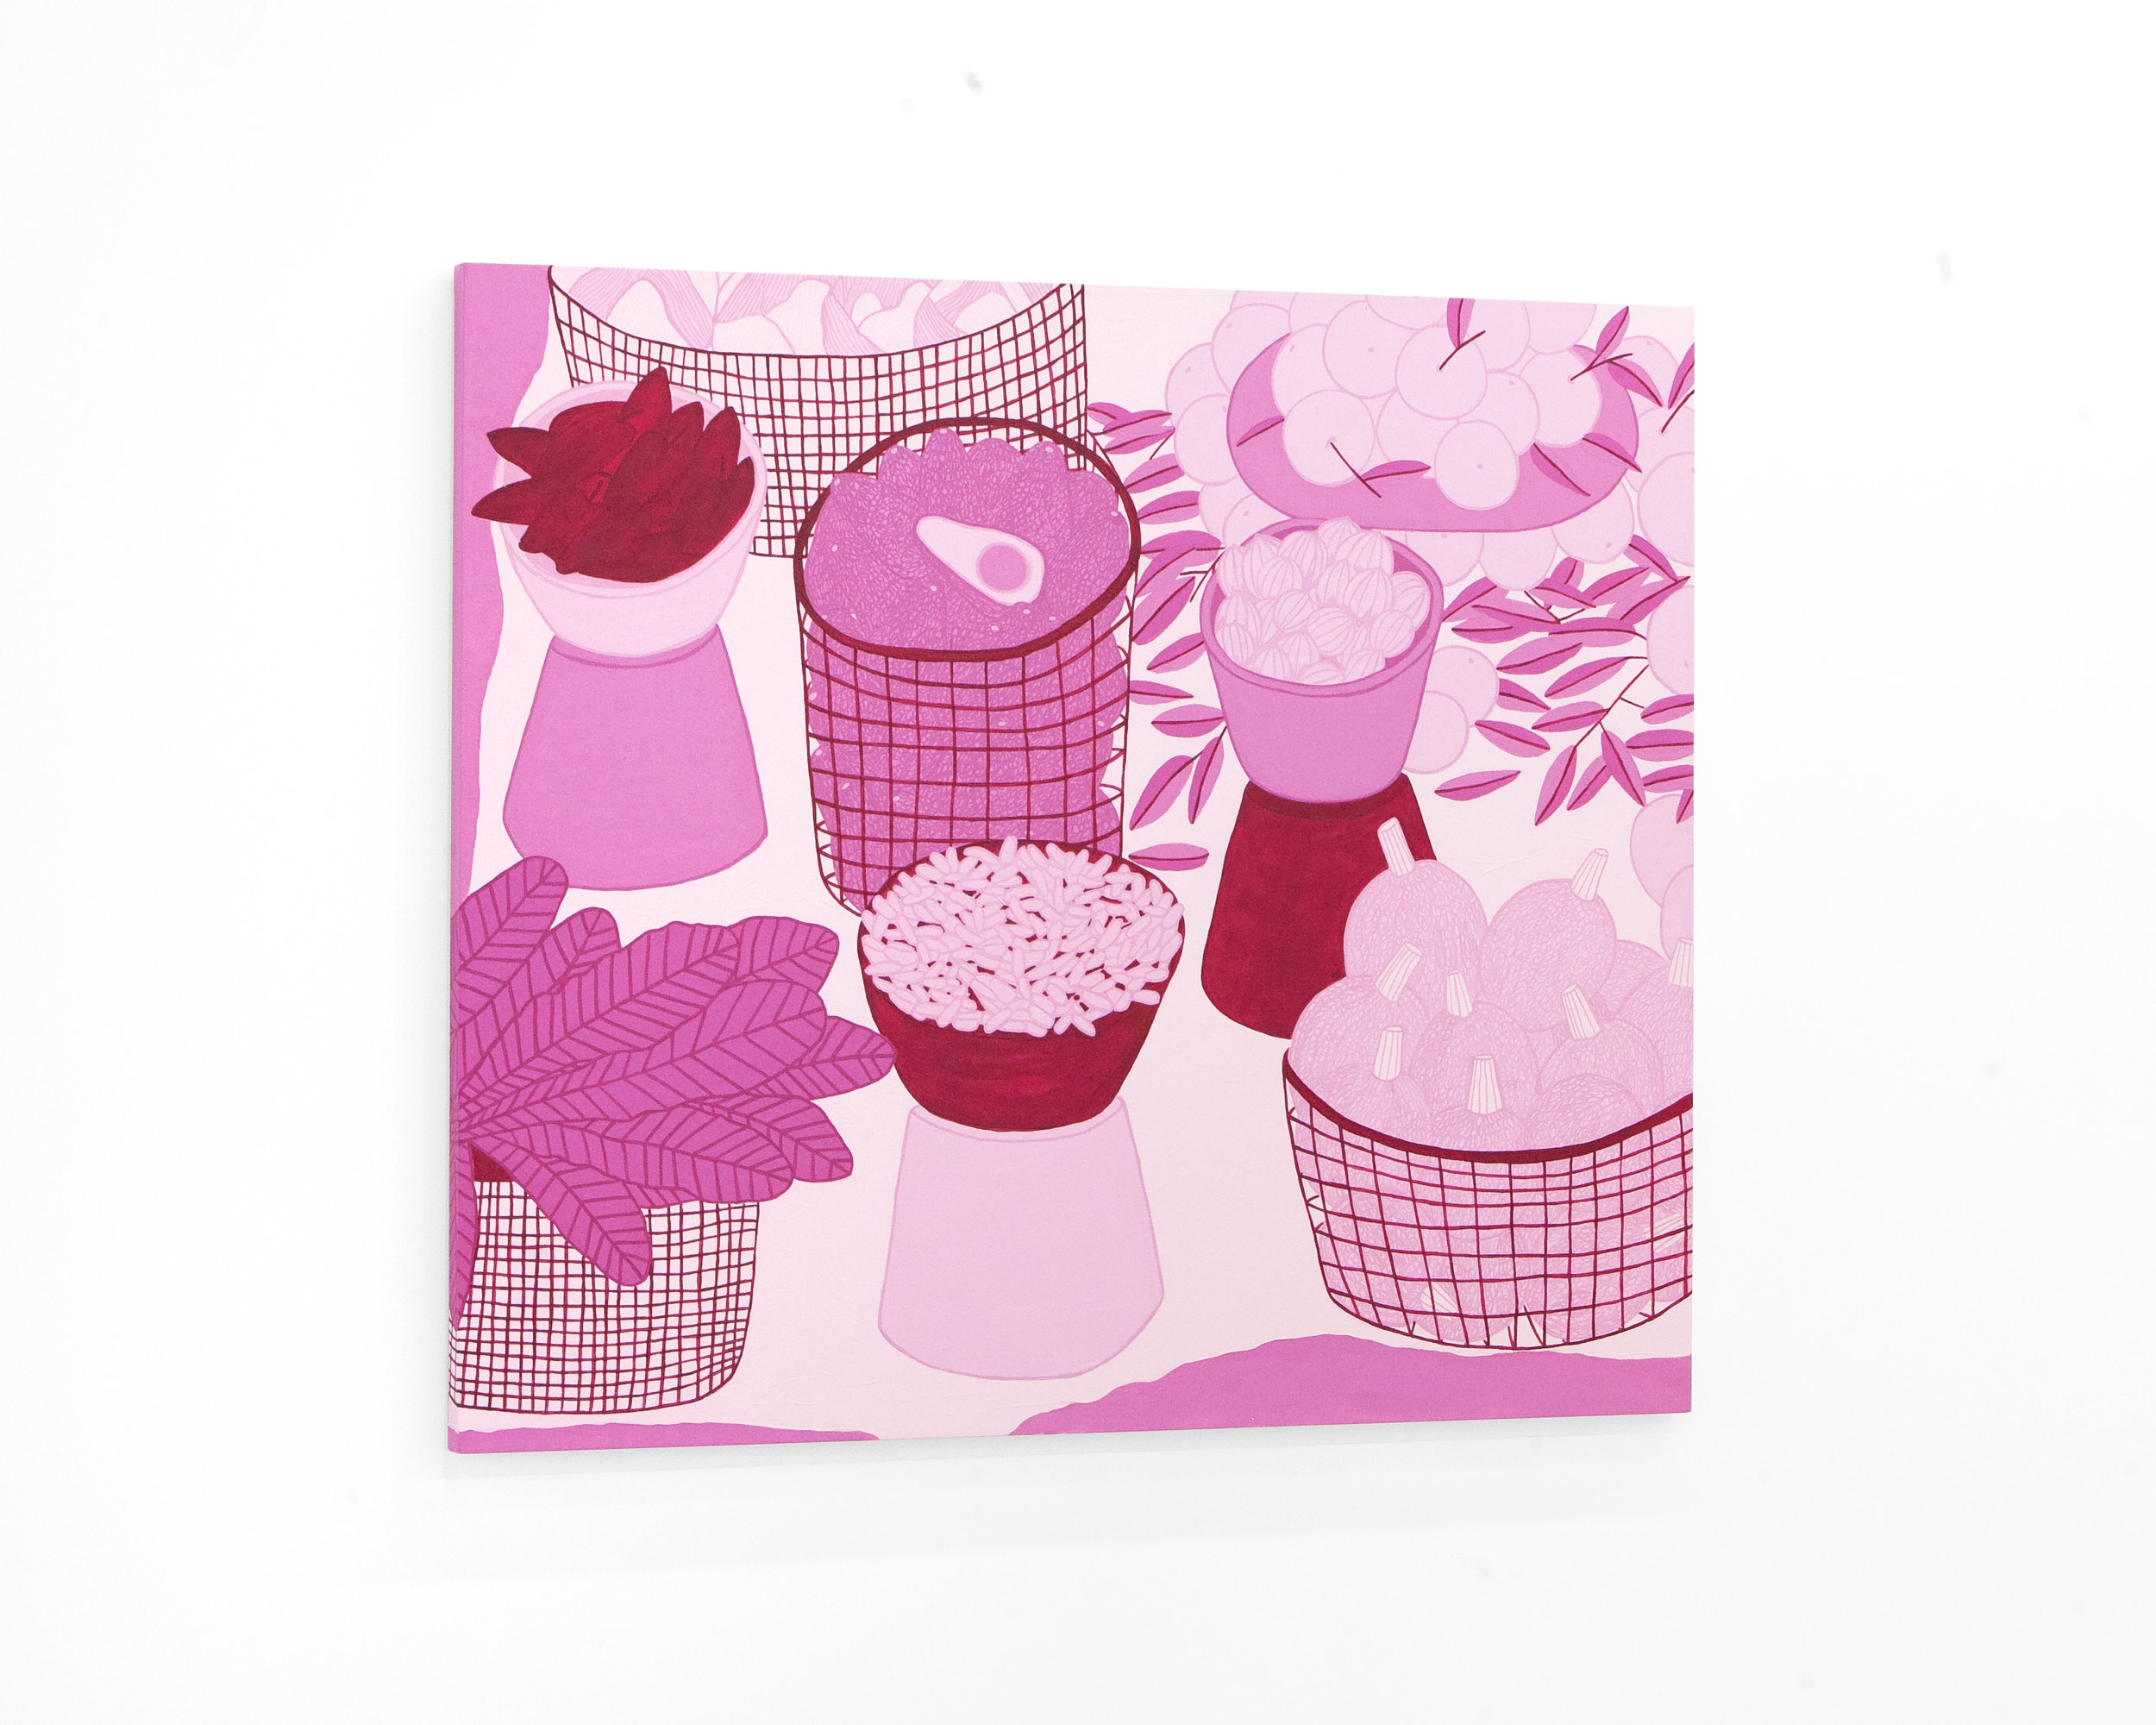 lizhernandez_pink_1__3.jpg